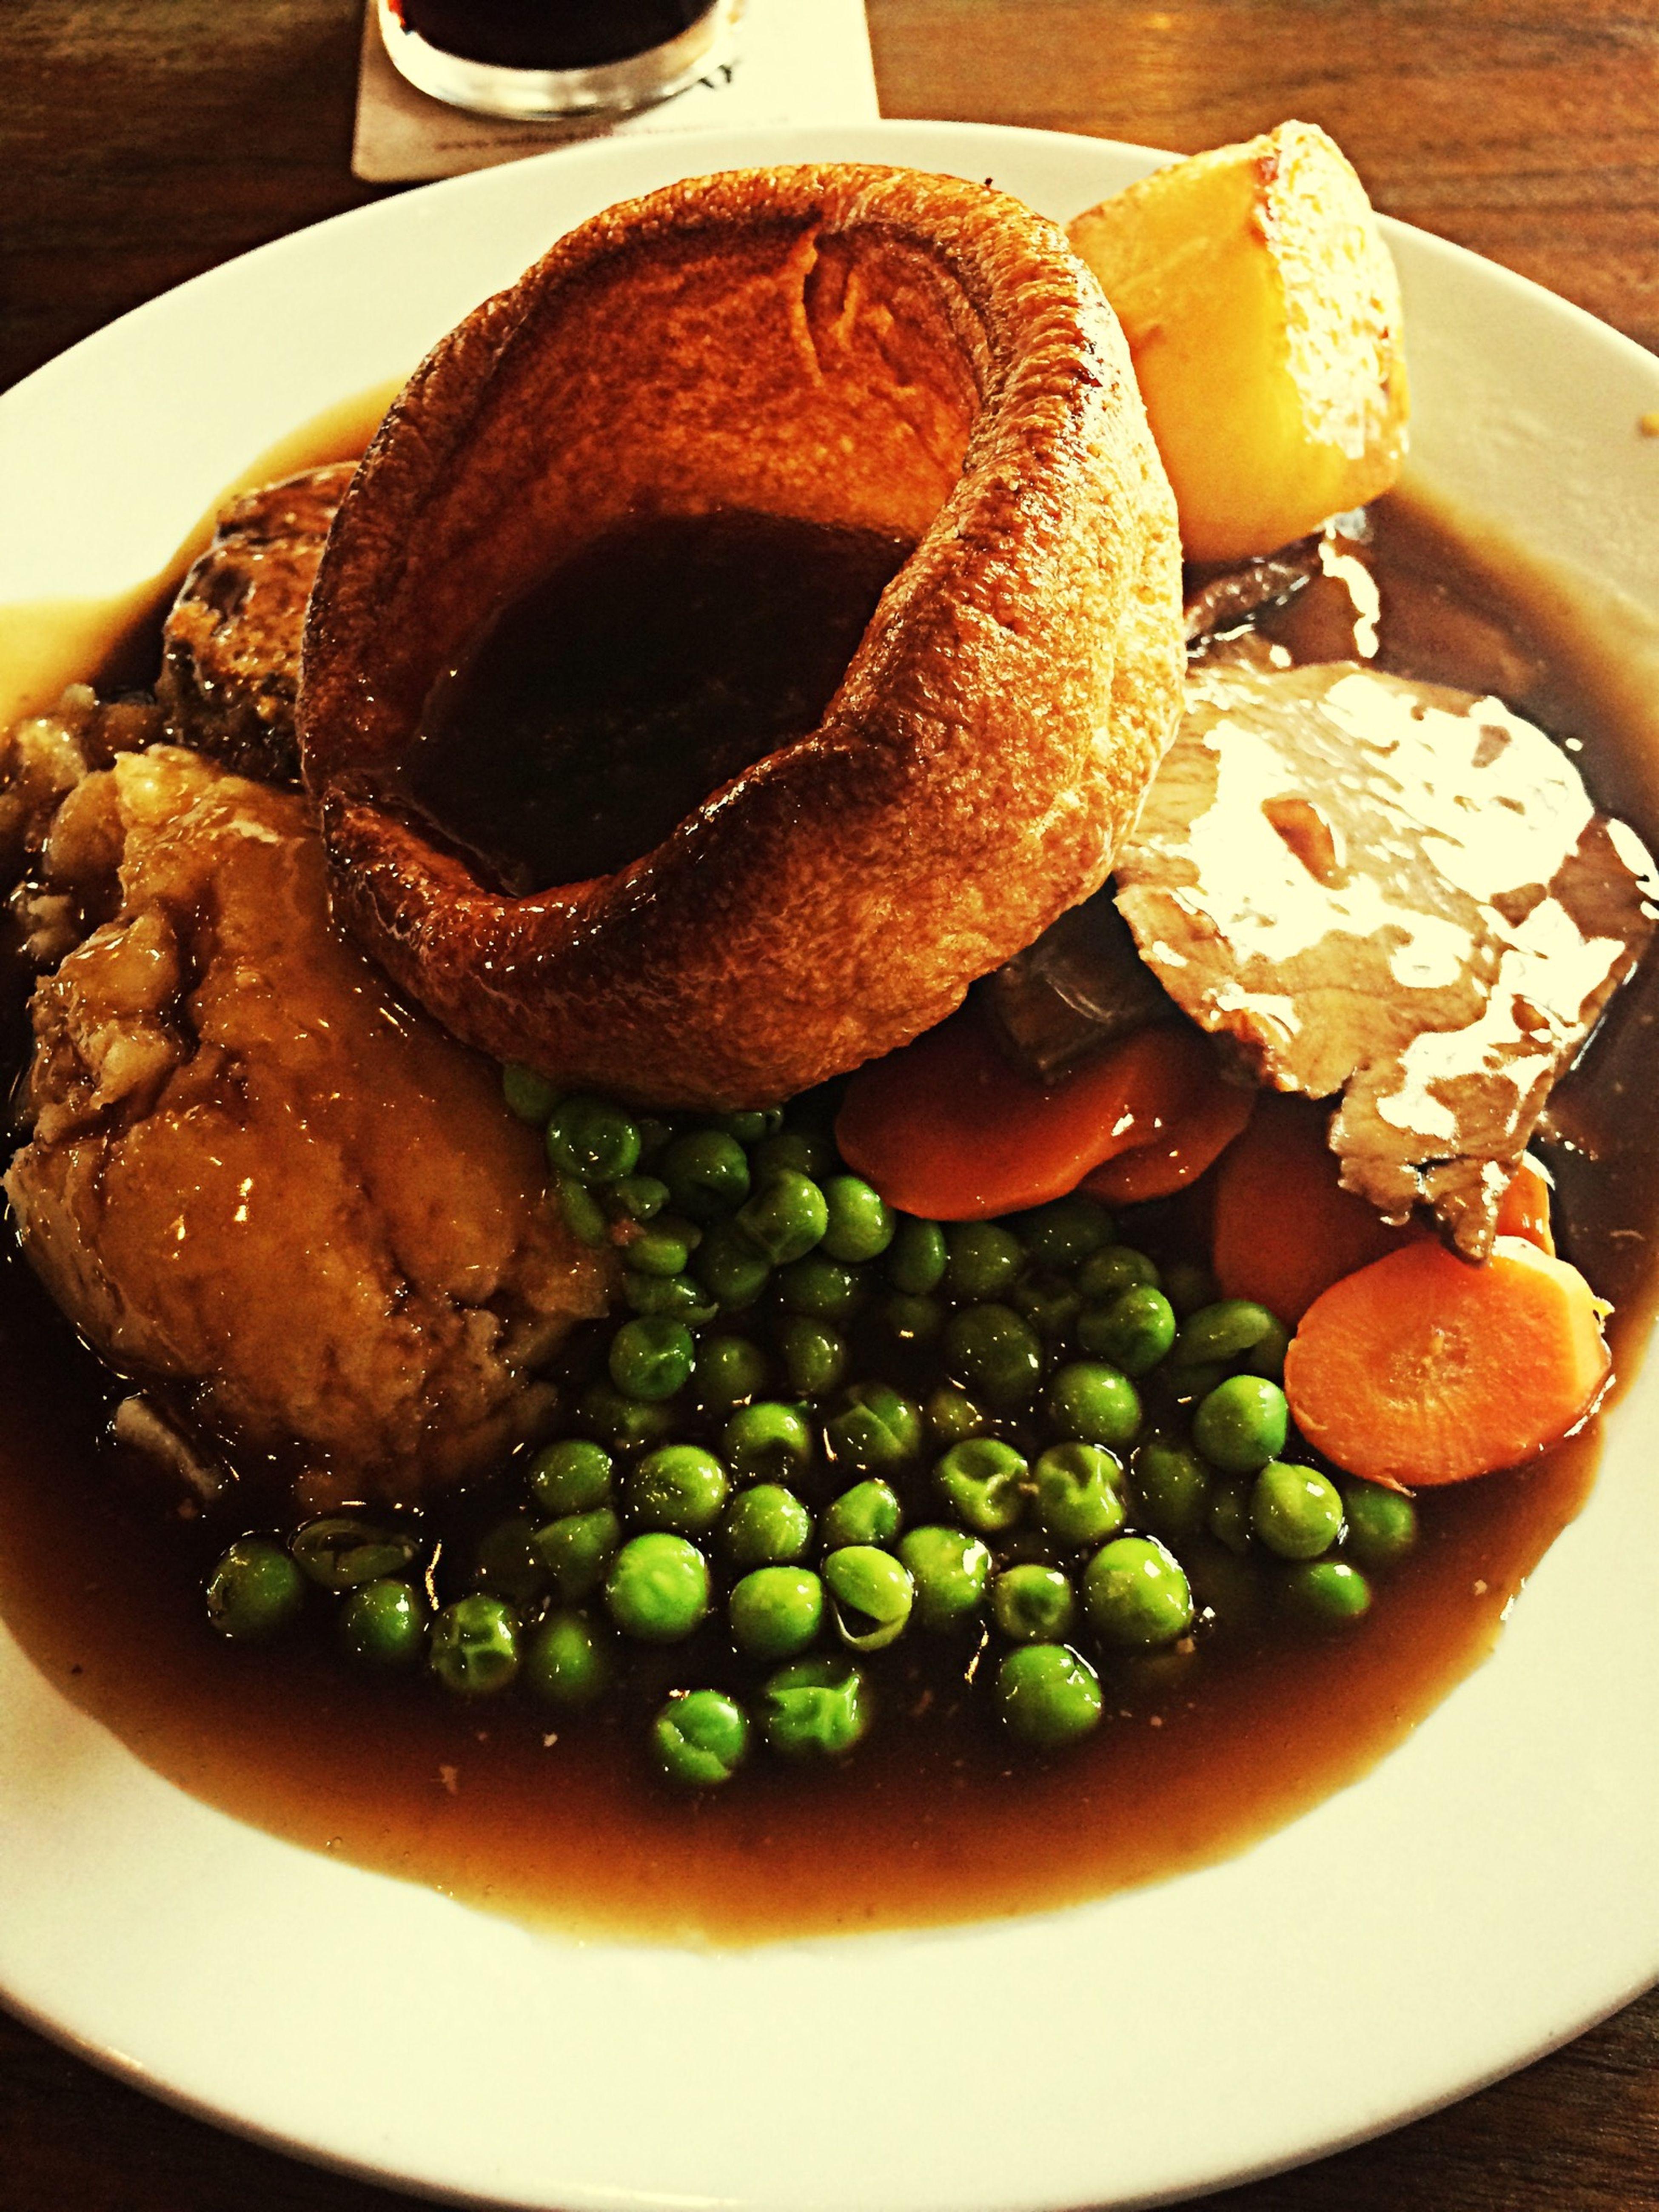 Besr Sunday lunch in Nottingham.